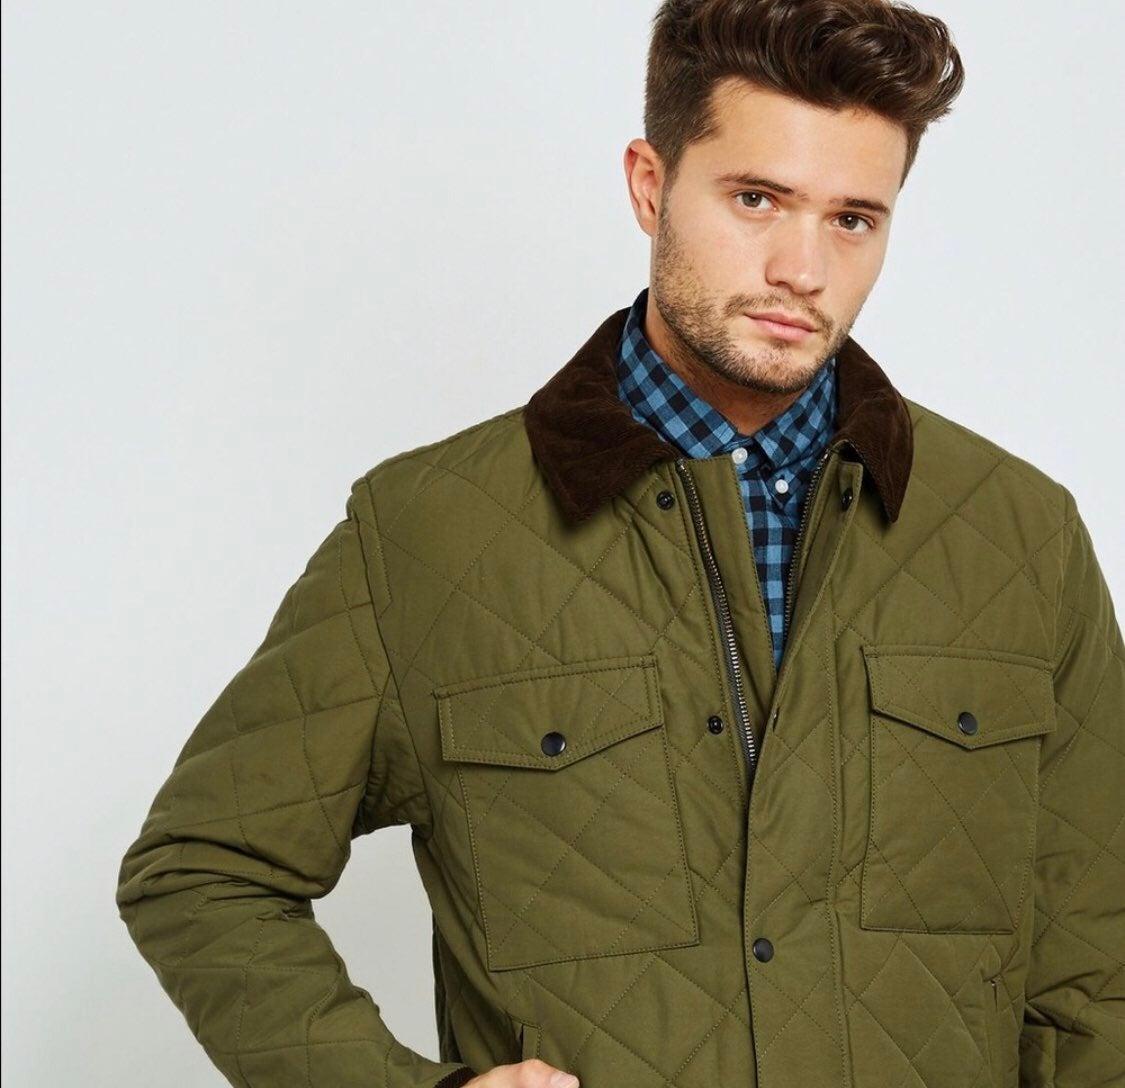 Jcrew new primaloft Jacket